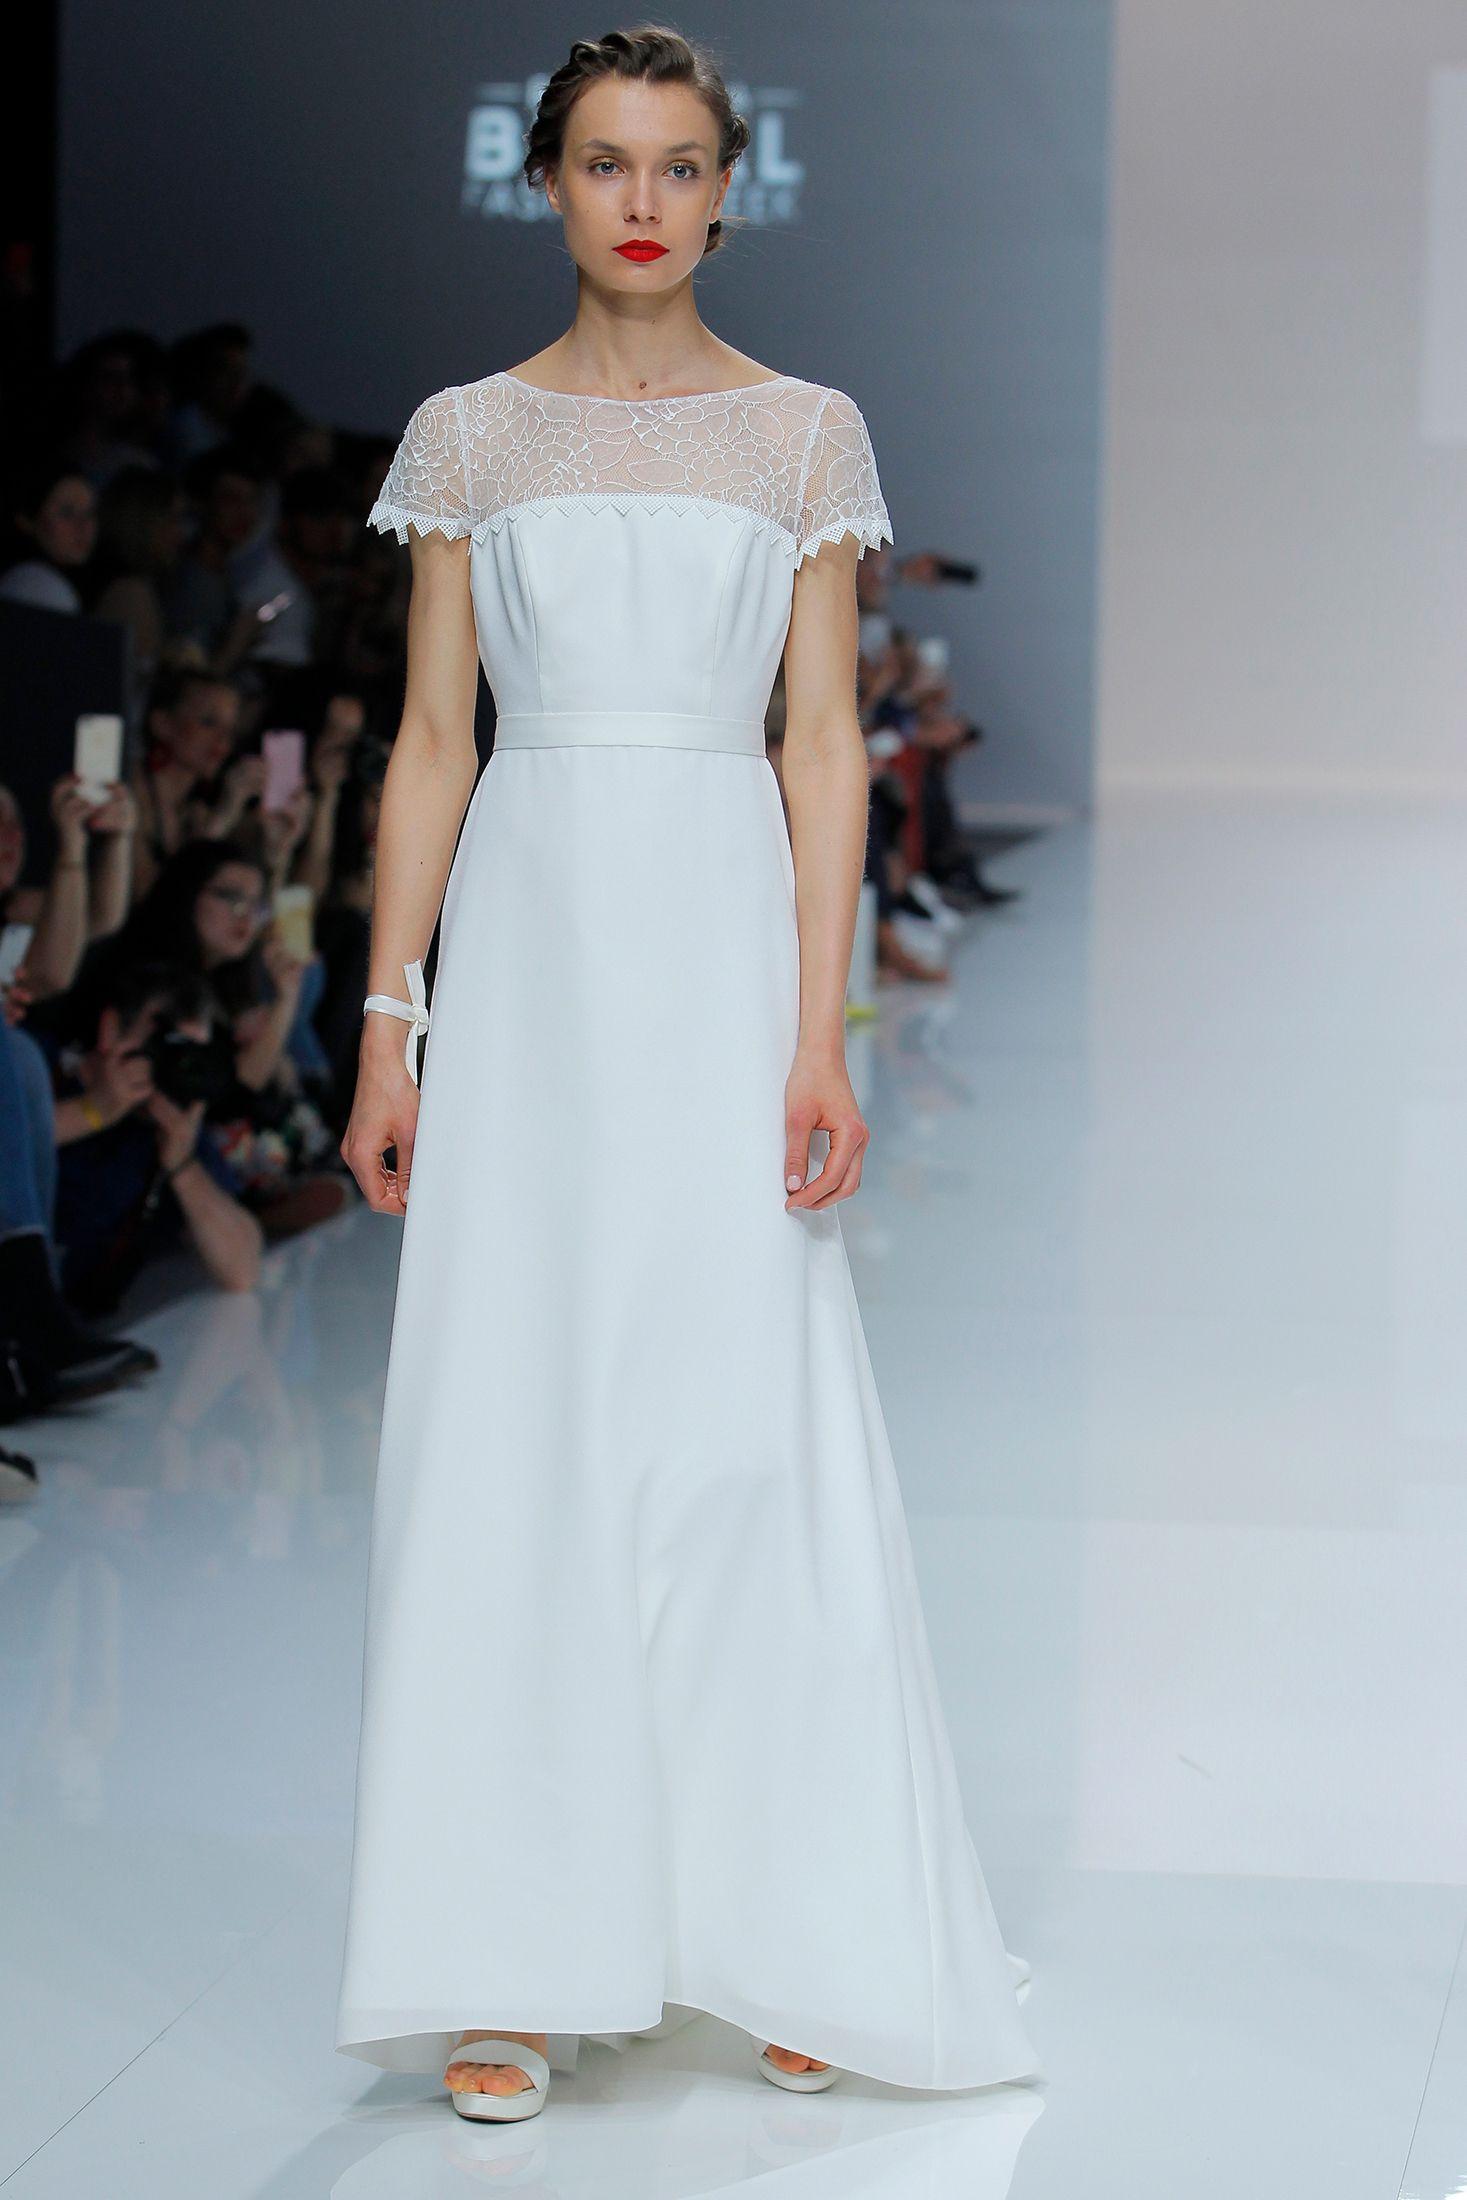 Vestido de Novia de Cymbeline - CY 039 #wedding #bodas #boda ...